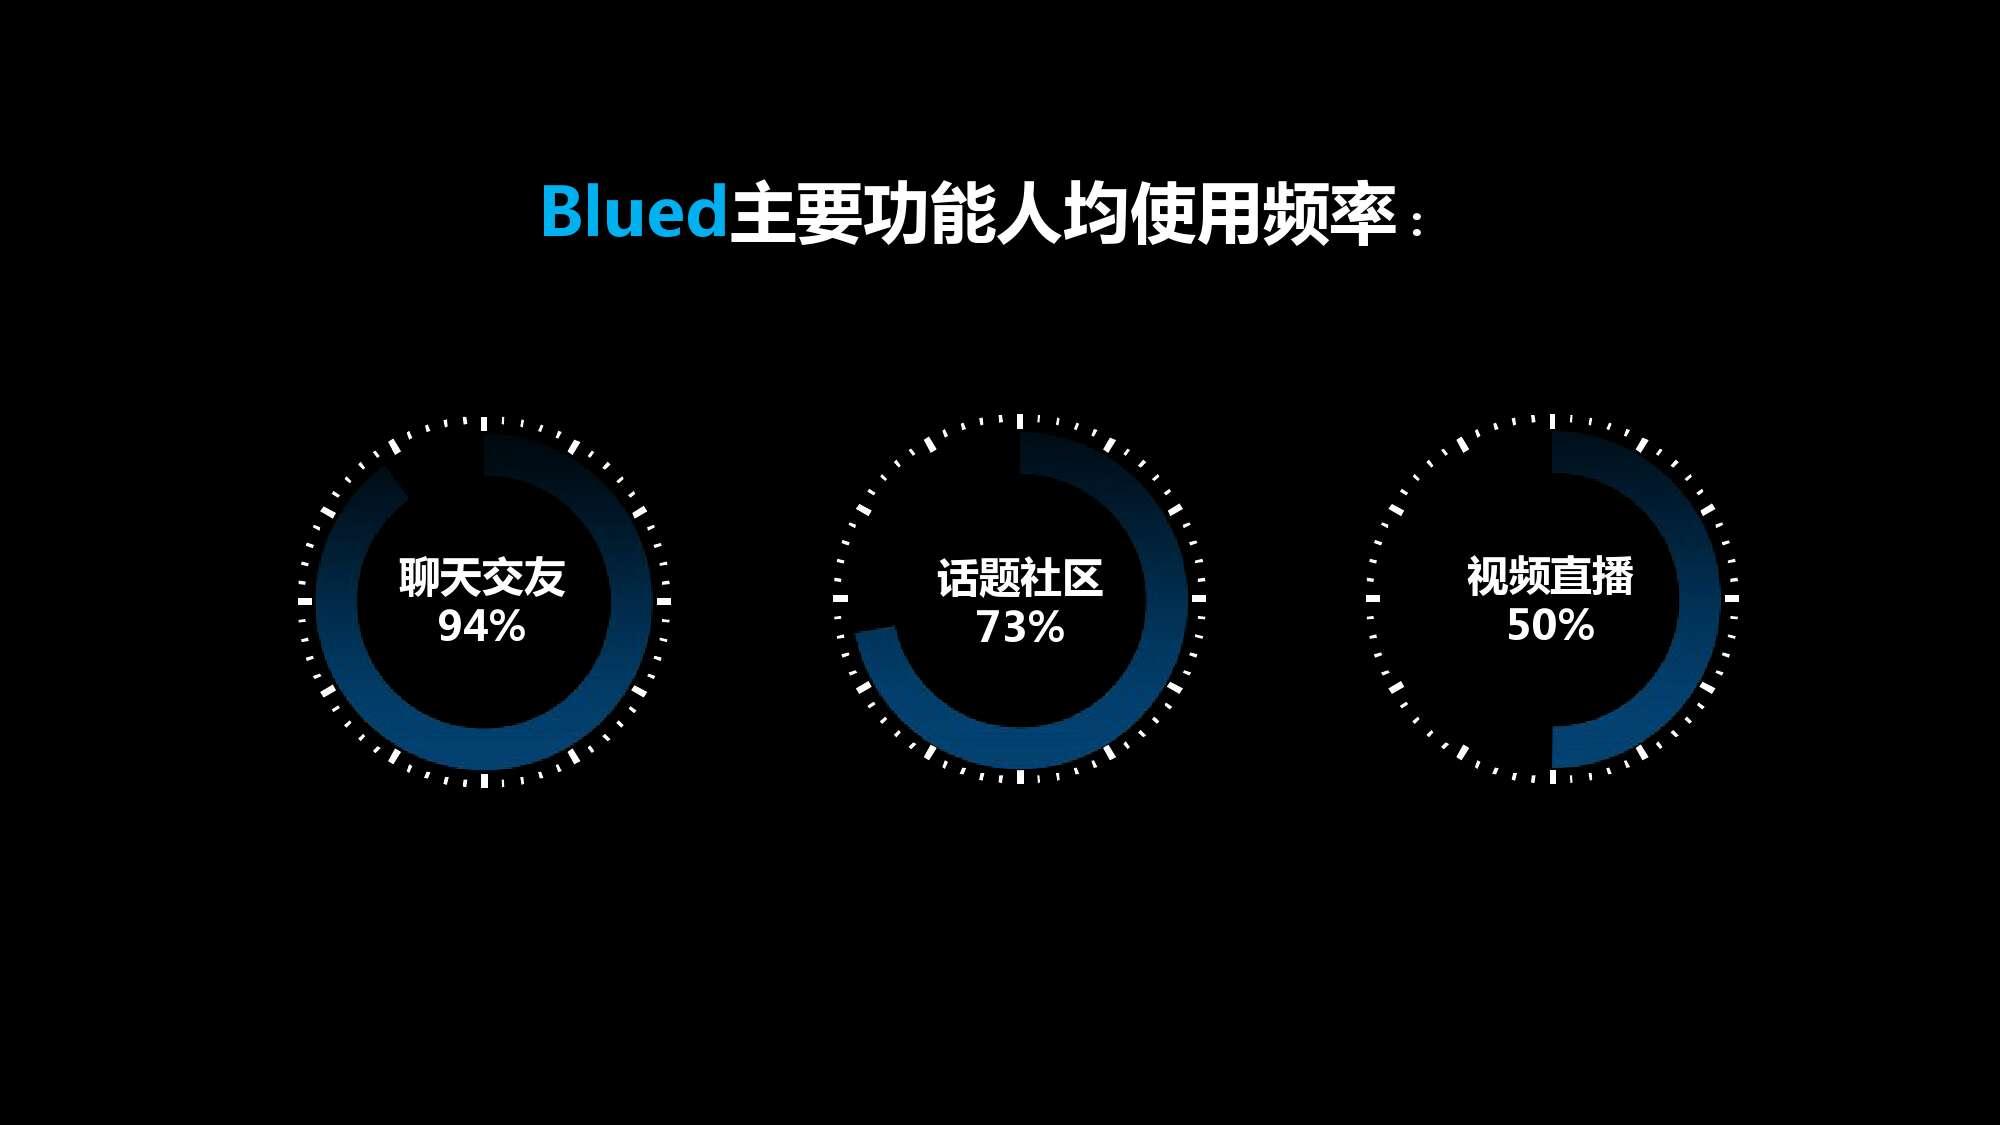 Blued2015中国同志社群大数据白皮书_000020